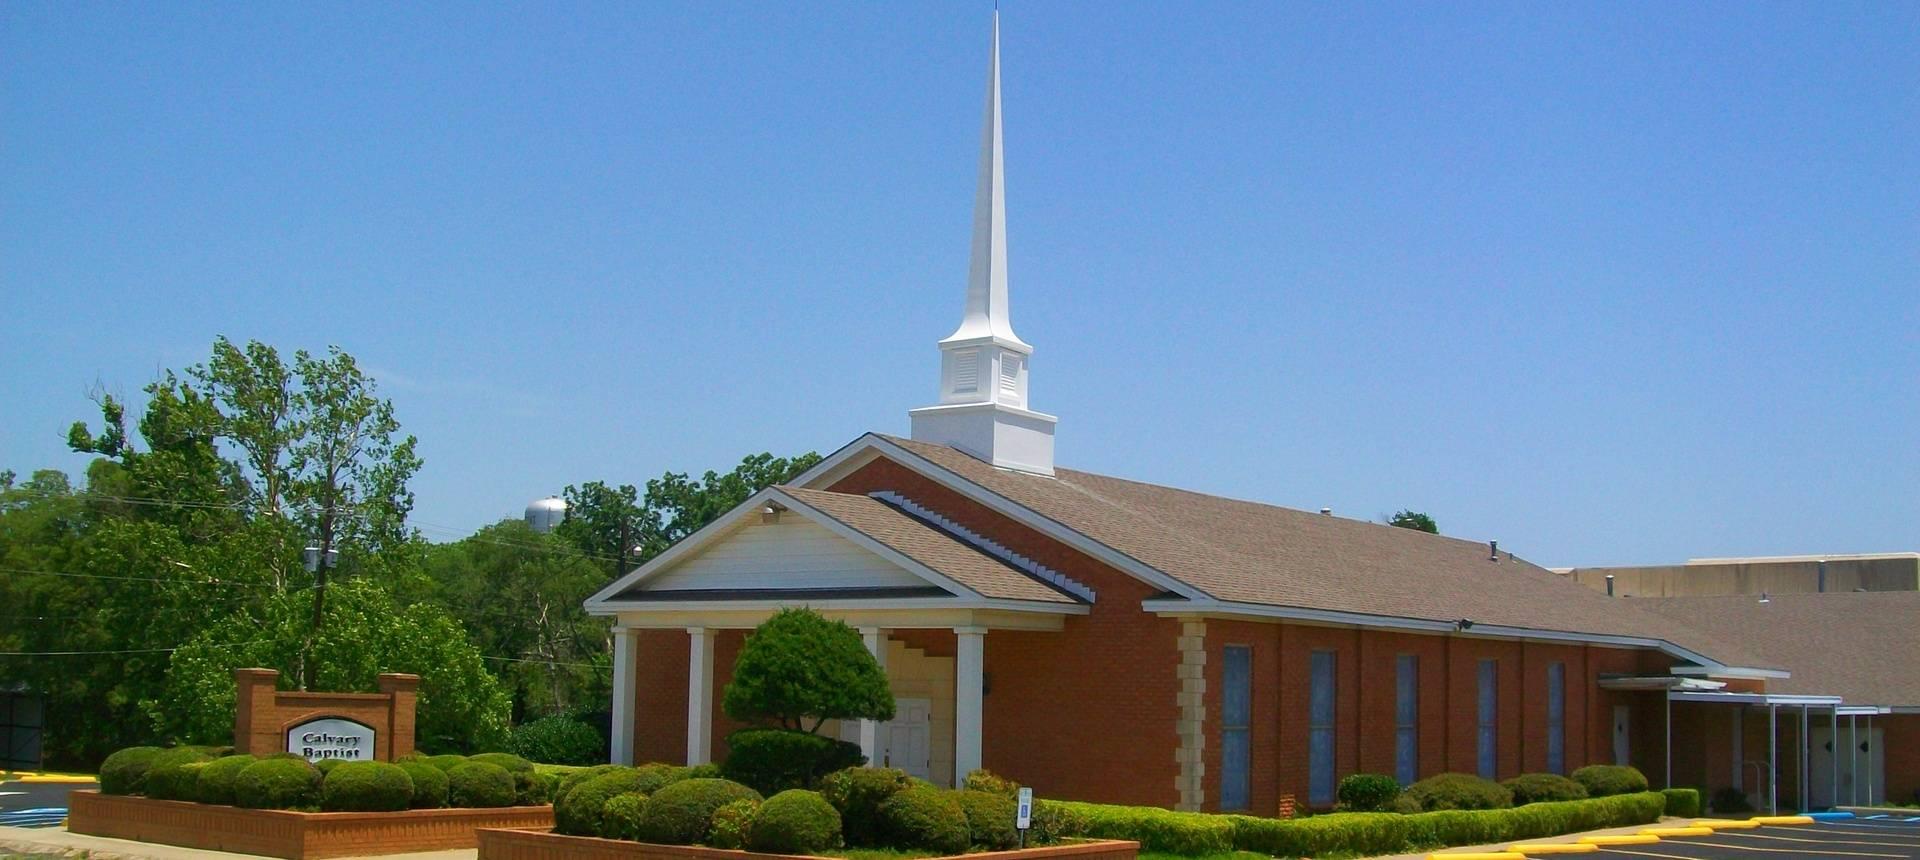 Calvary Baptist Church, Physical: 125 N. Jefferson St., Mailing: P.O. Box 484, Pilot Point, Texas, 76258, USA